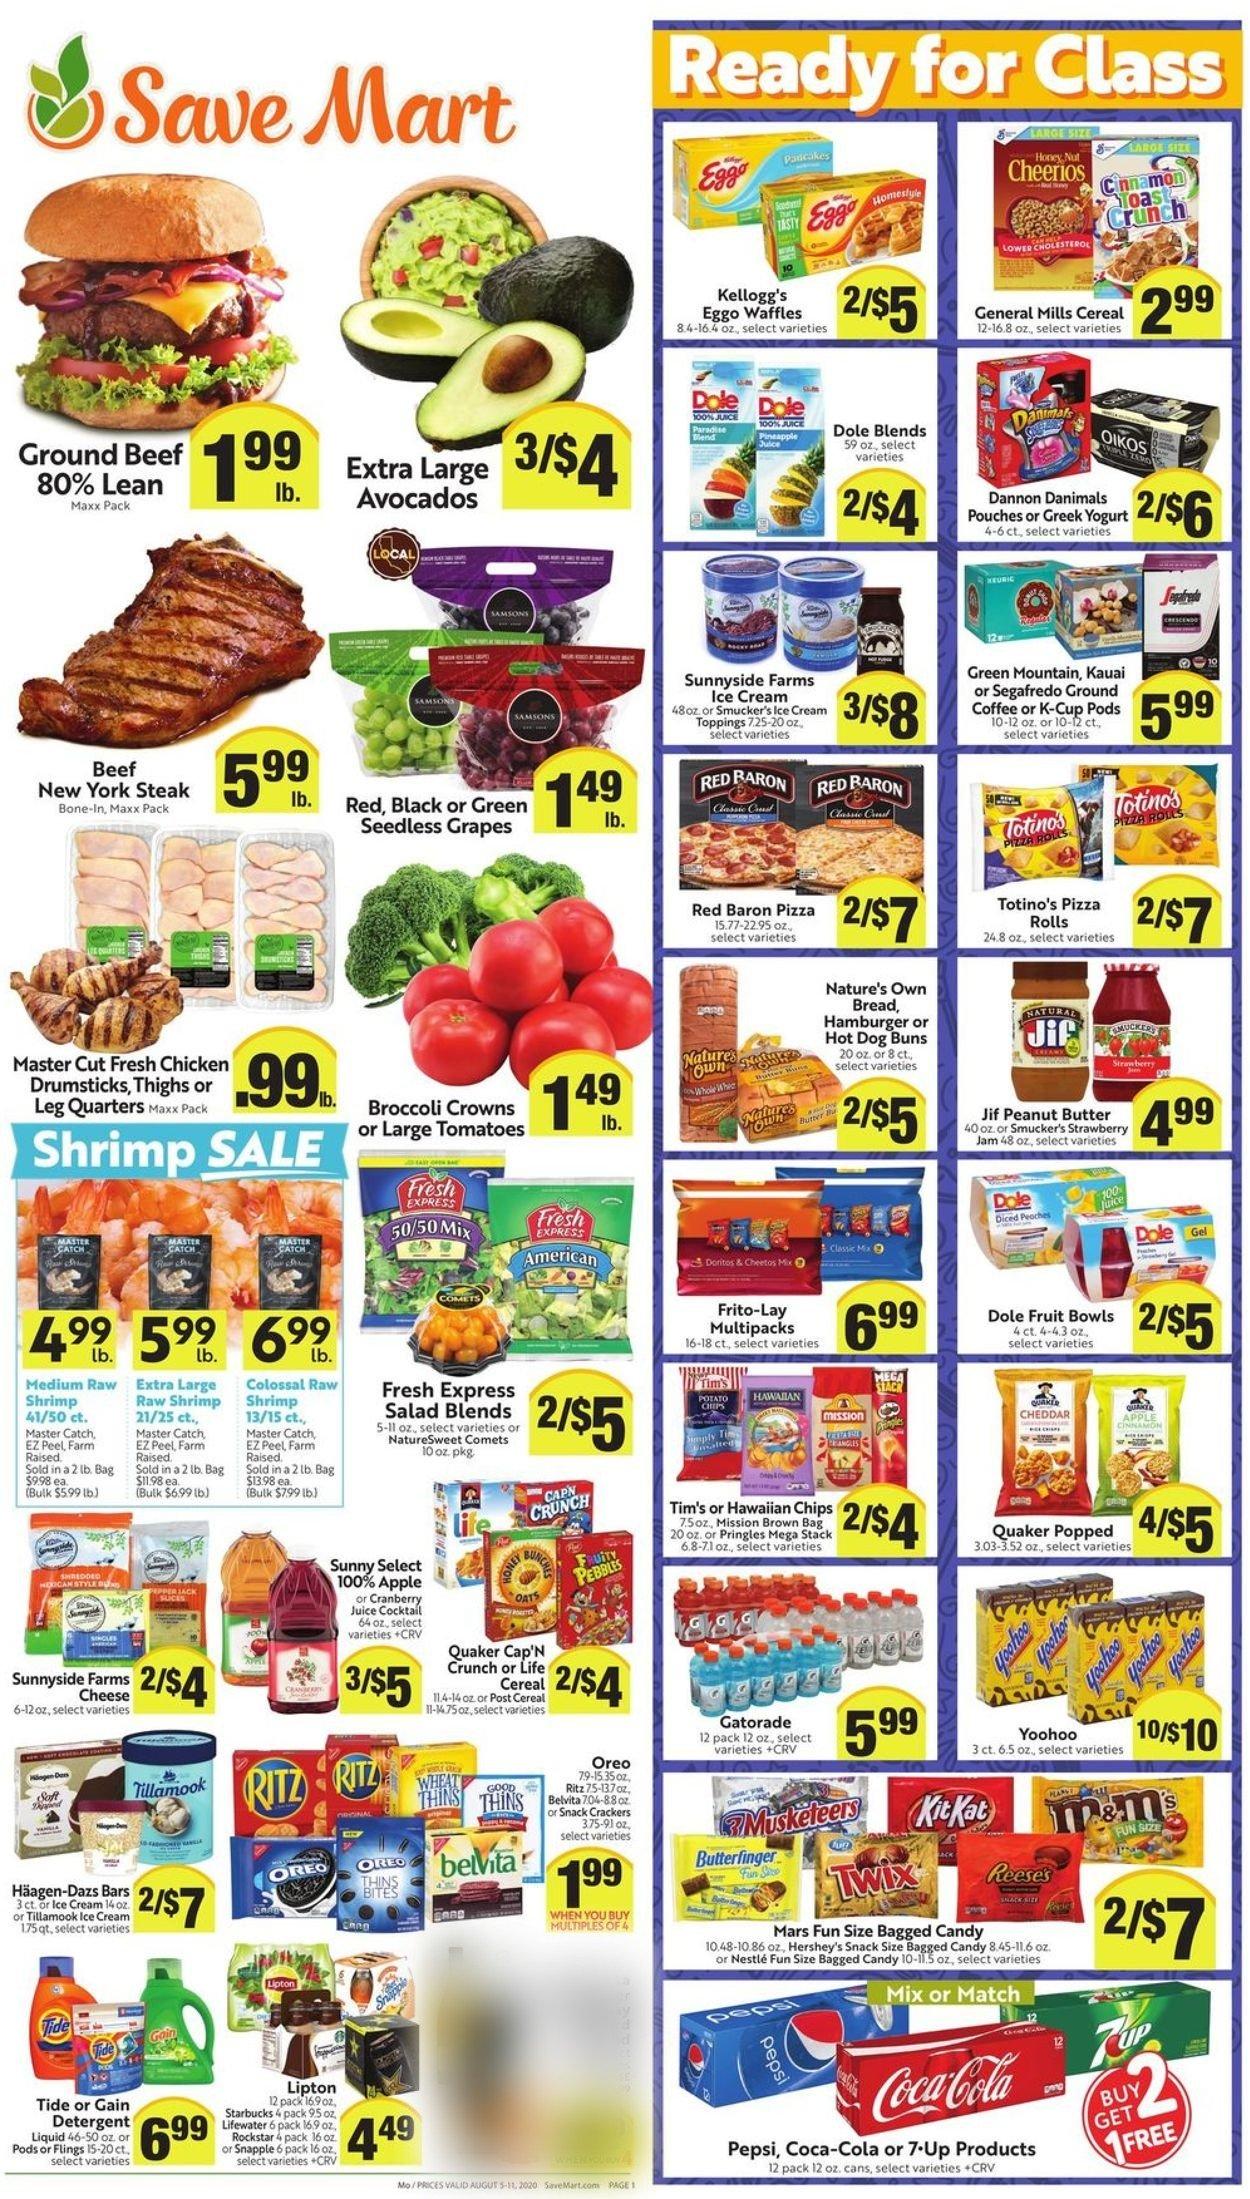 Save Mart Weekly Ad Circular - valid 08/05-08/11/2020